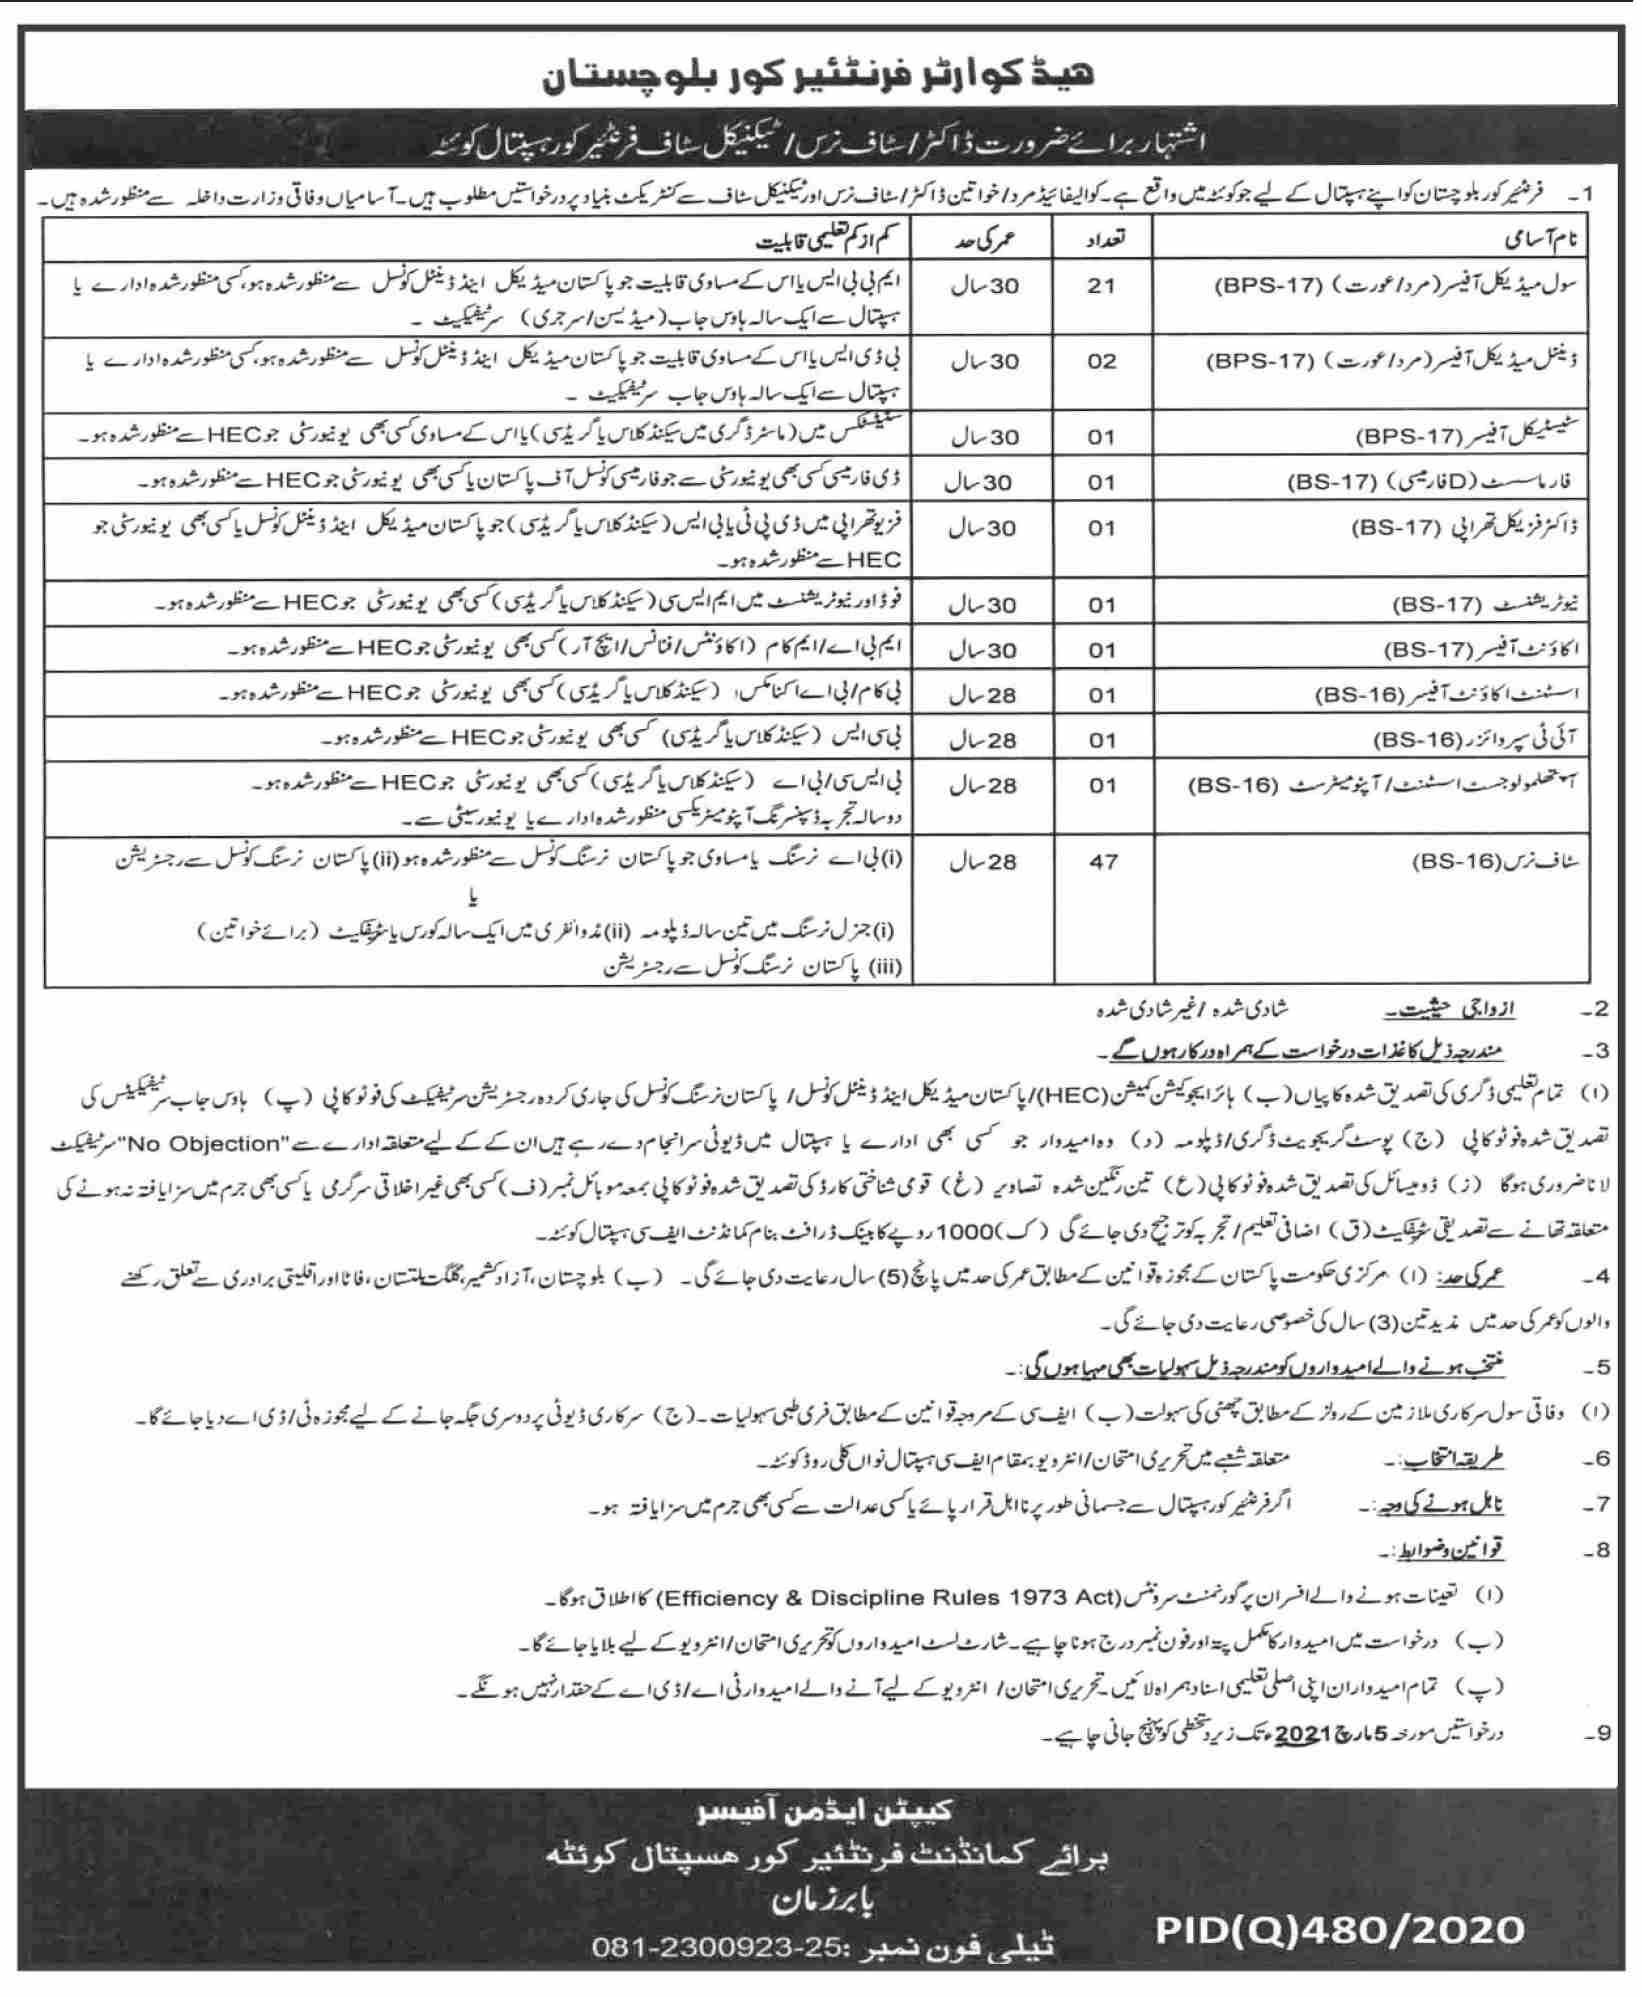 Frontier Corps Jobs 2021 - FC Jobs 2021 - Frontier Corps FC Balochistan Jobs 2021 - FC Quetta Hospital Jobs 2021 - New FC Frontier Corps Jobs 2021 in Pakistan